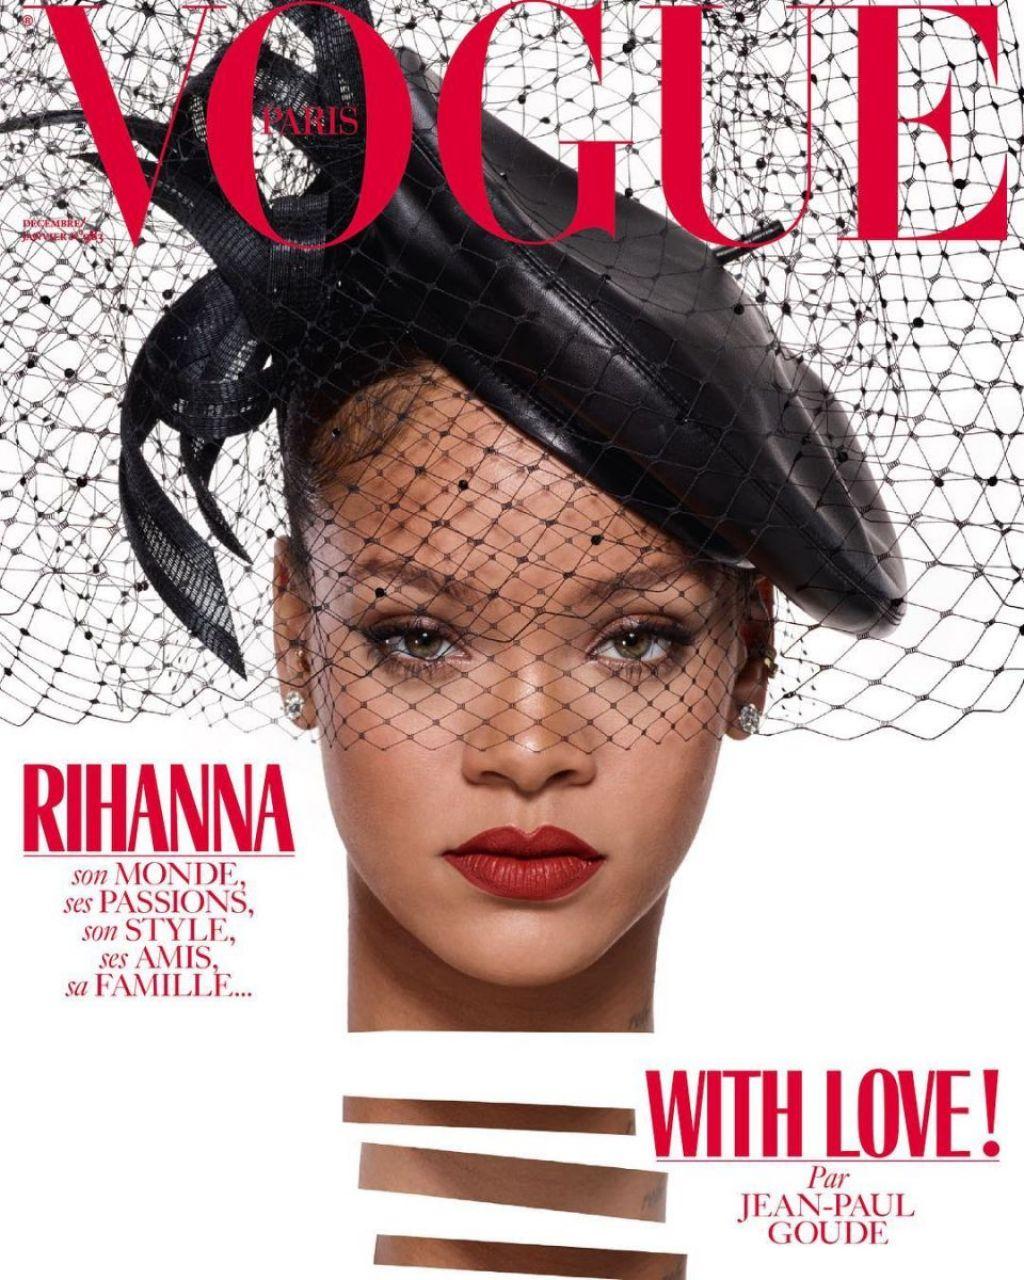 Vogue Paris: Vogue Magazine Paris December 2017/January 2018